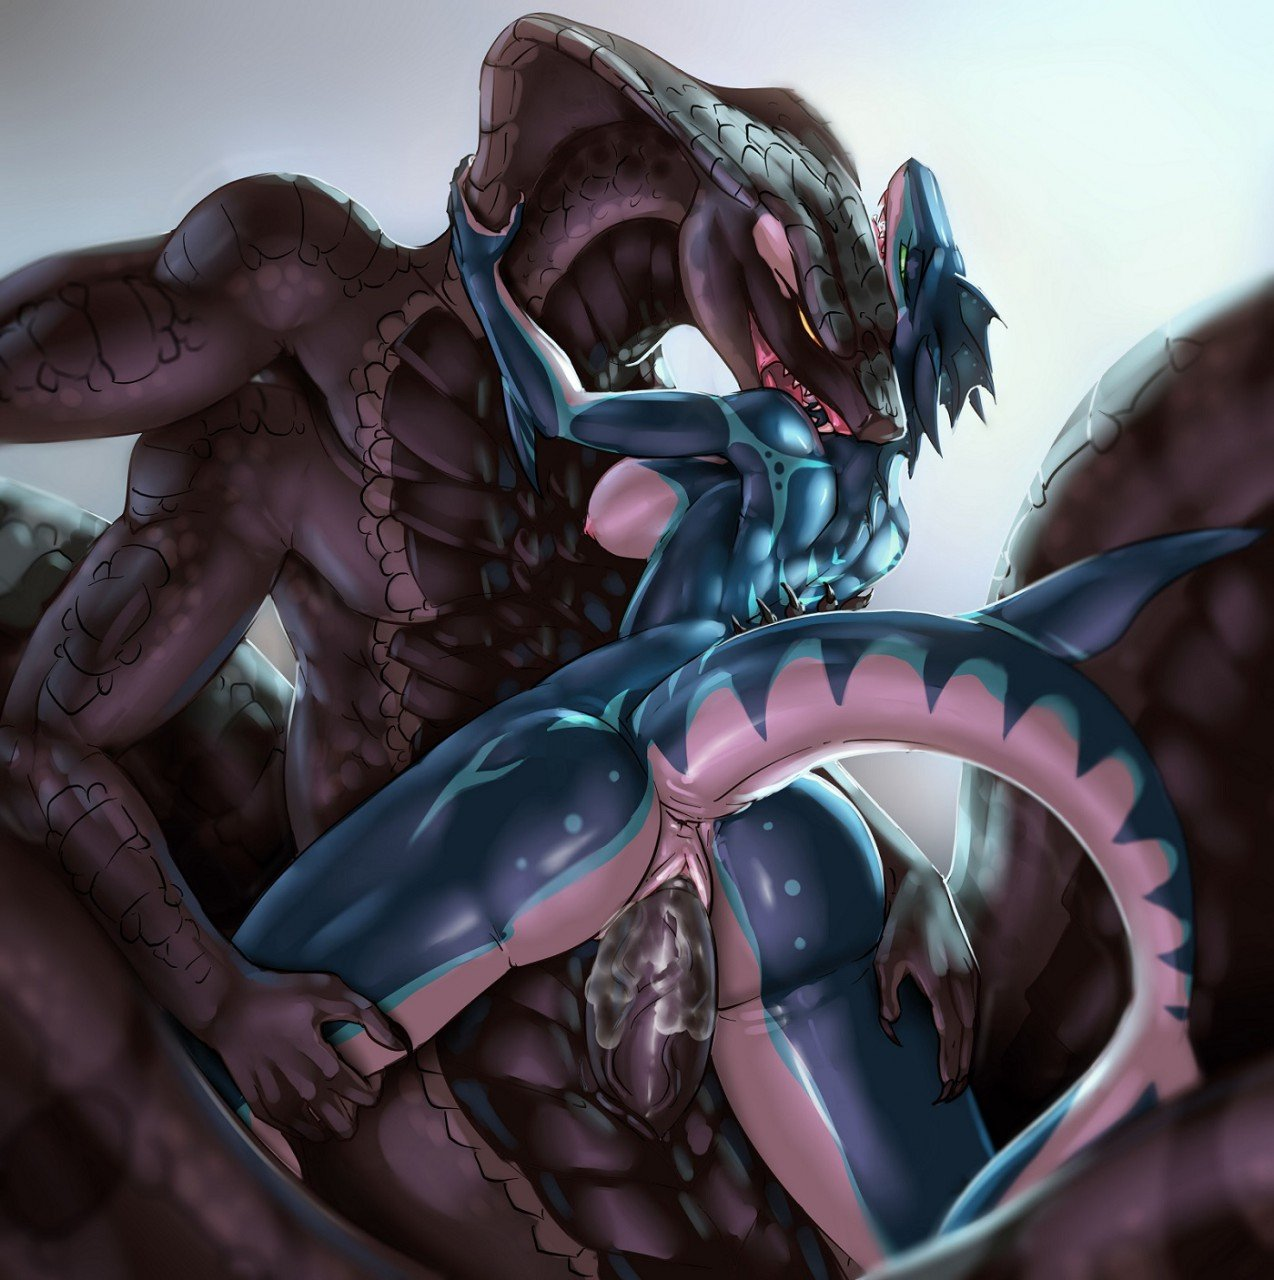 Estrogen turns male snakes into same